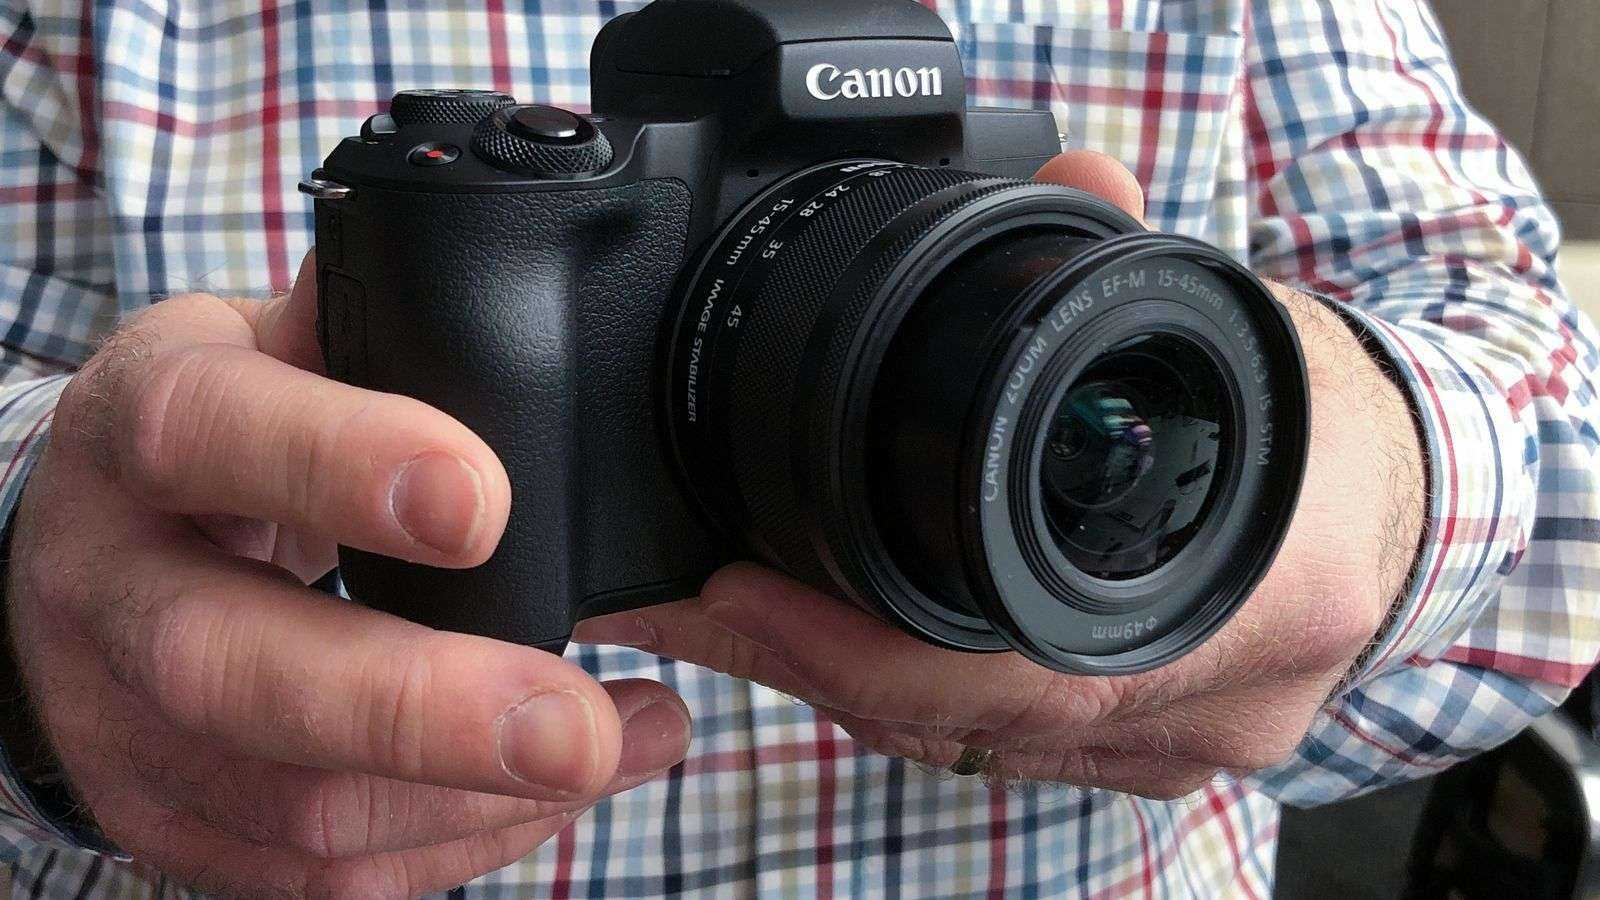 Canon выпустила беззеркальную полнокадровую камеру EOS R (canon eos m50 for hero)